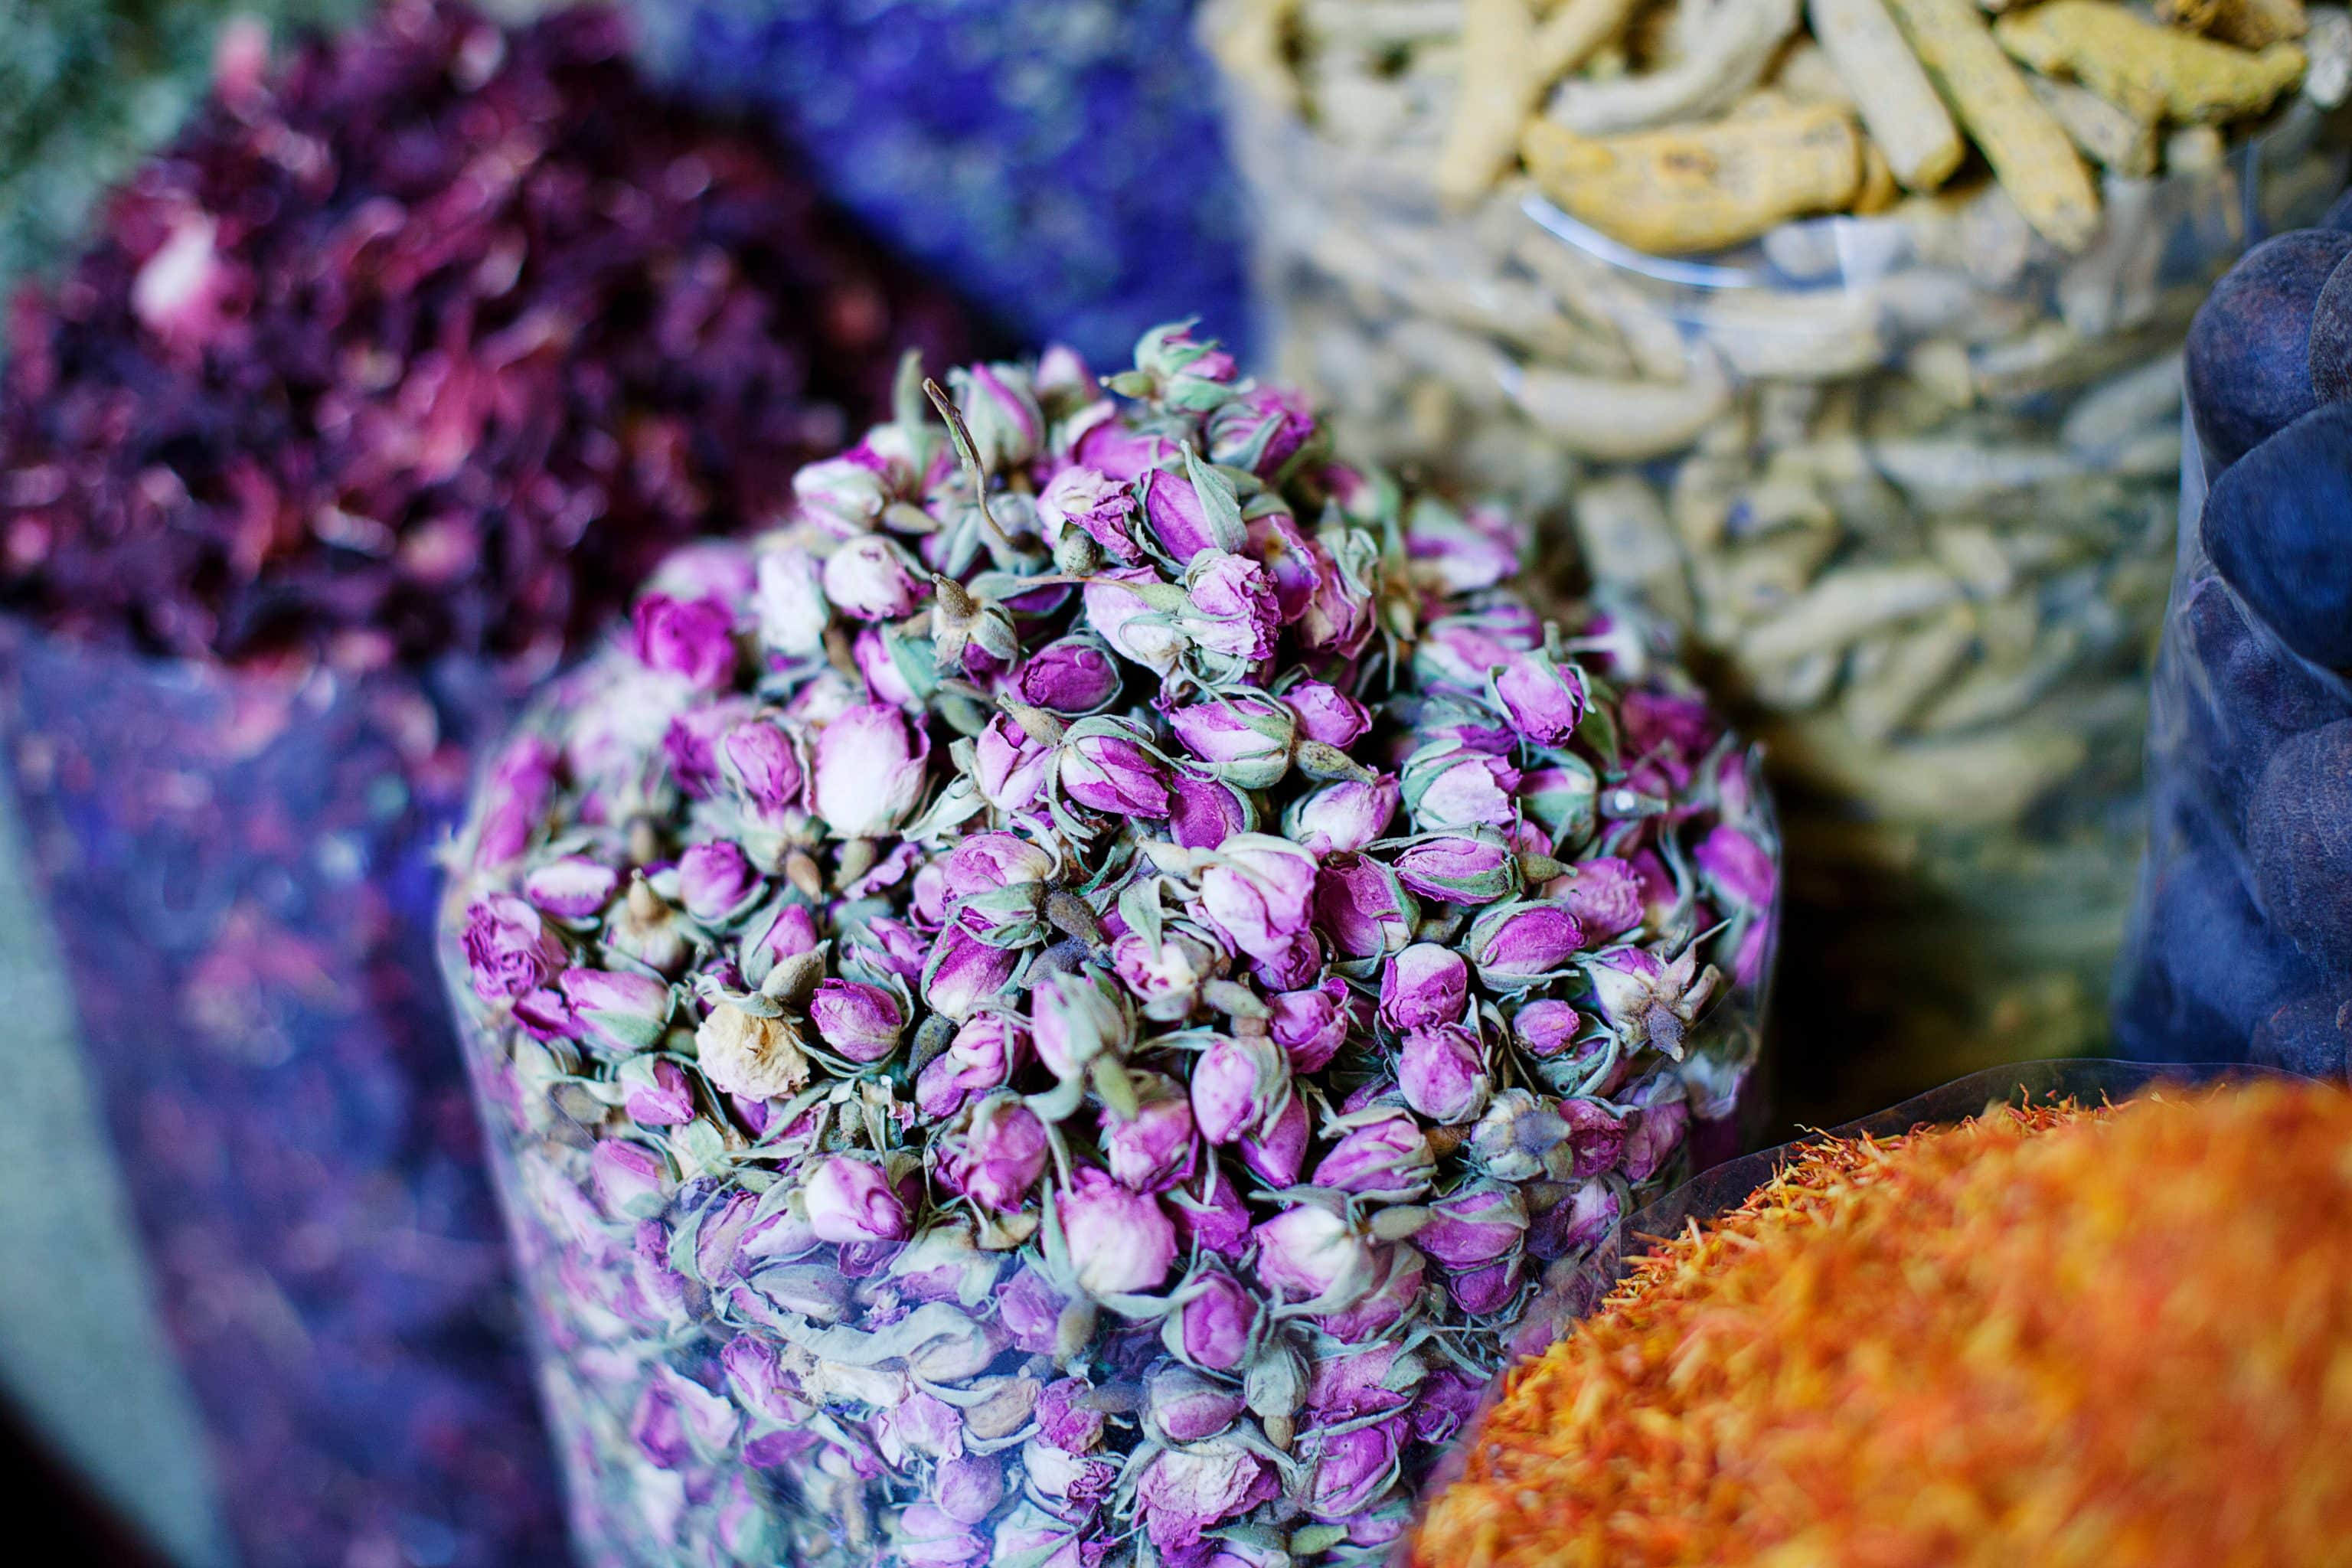 The Spice Souk in Deira